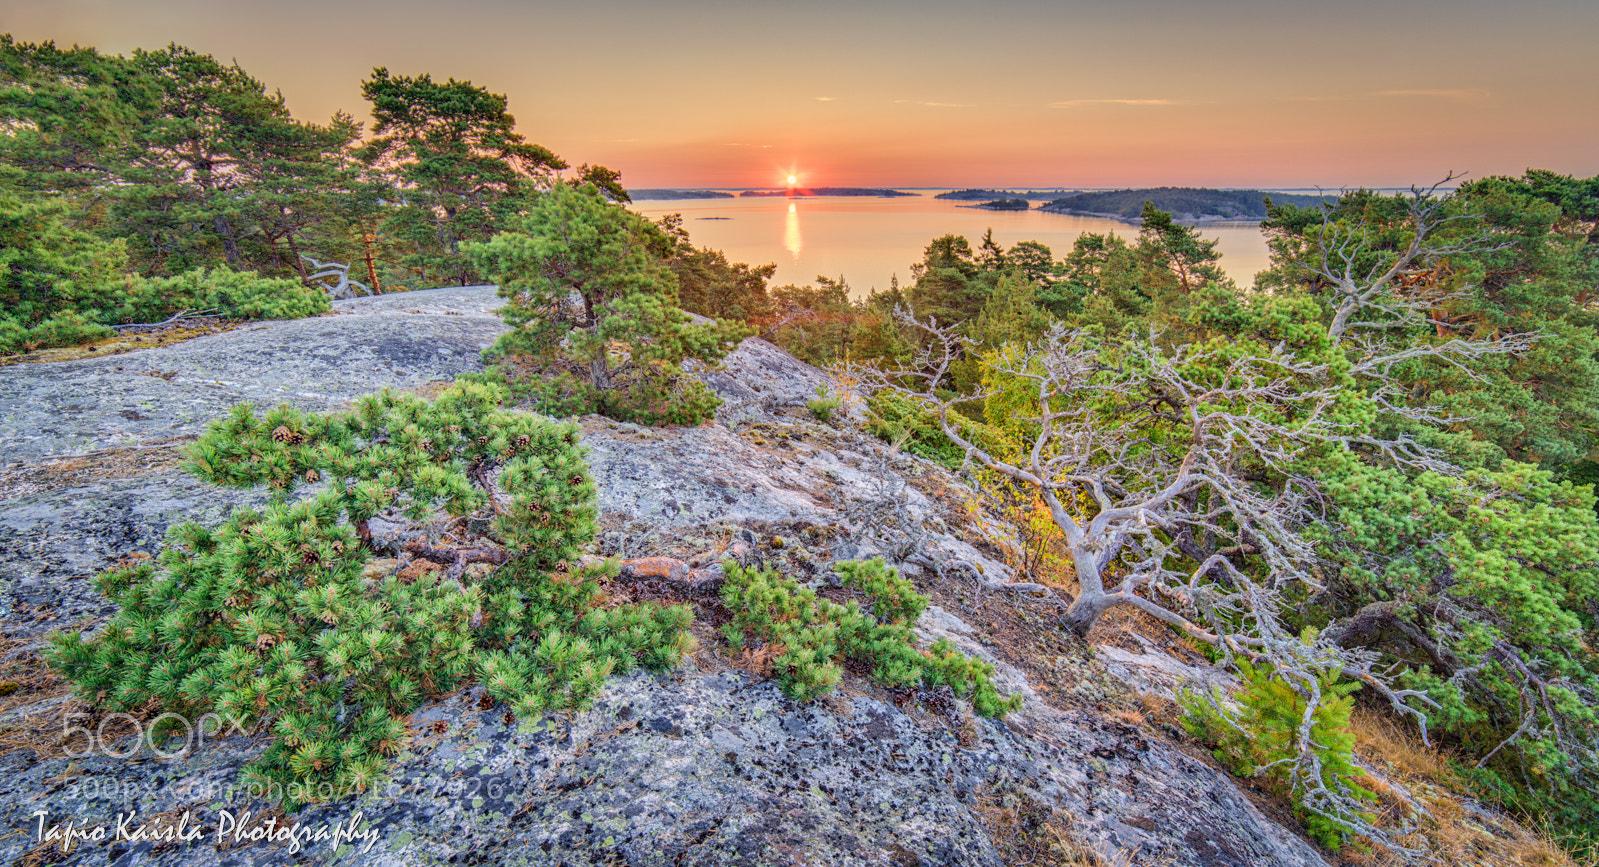 Photograph Pearl of the Archipelago Sea by Tapio Kaisla on 500px